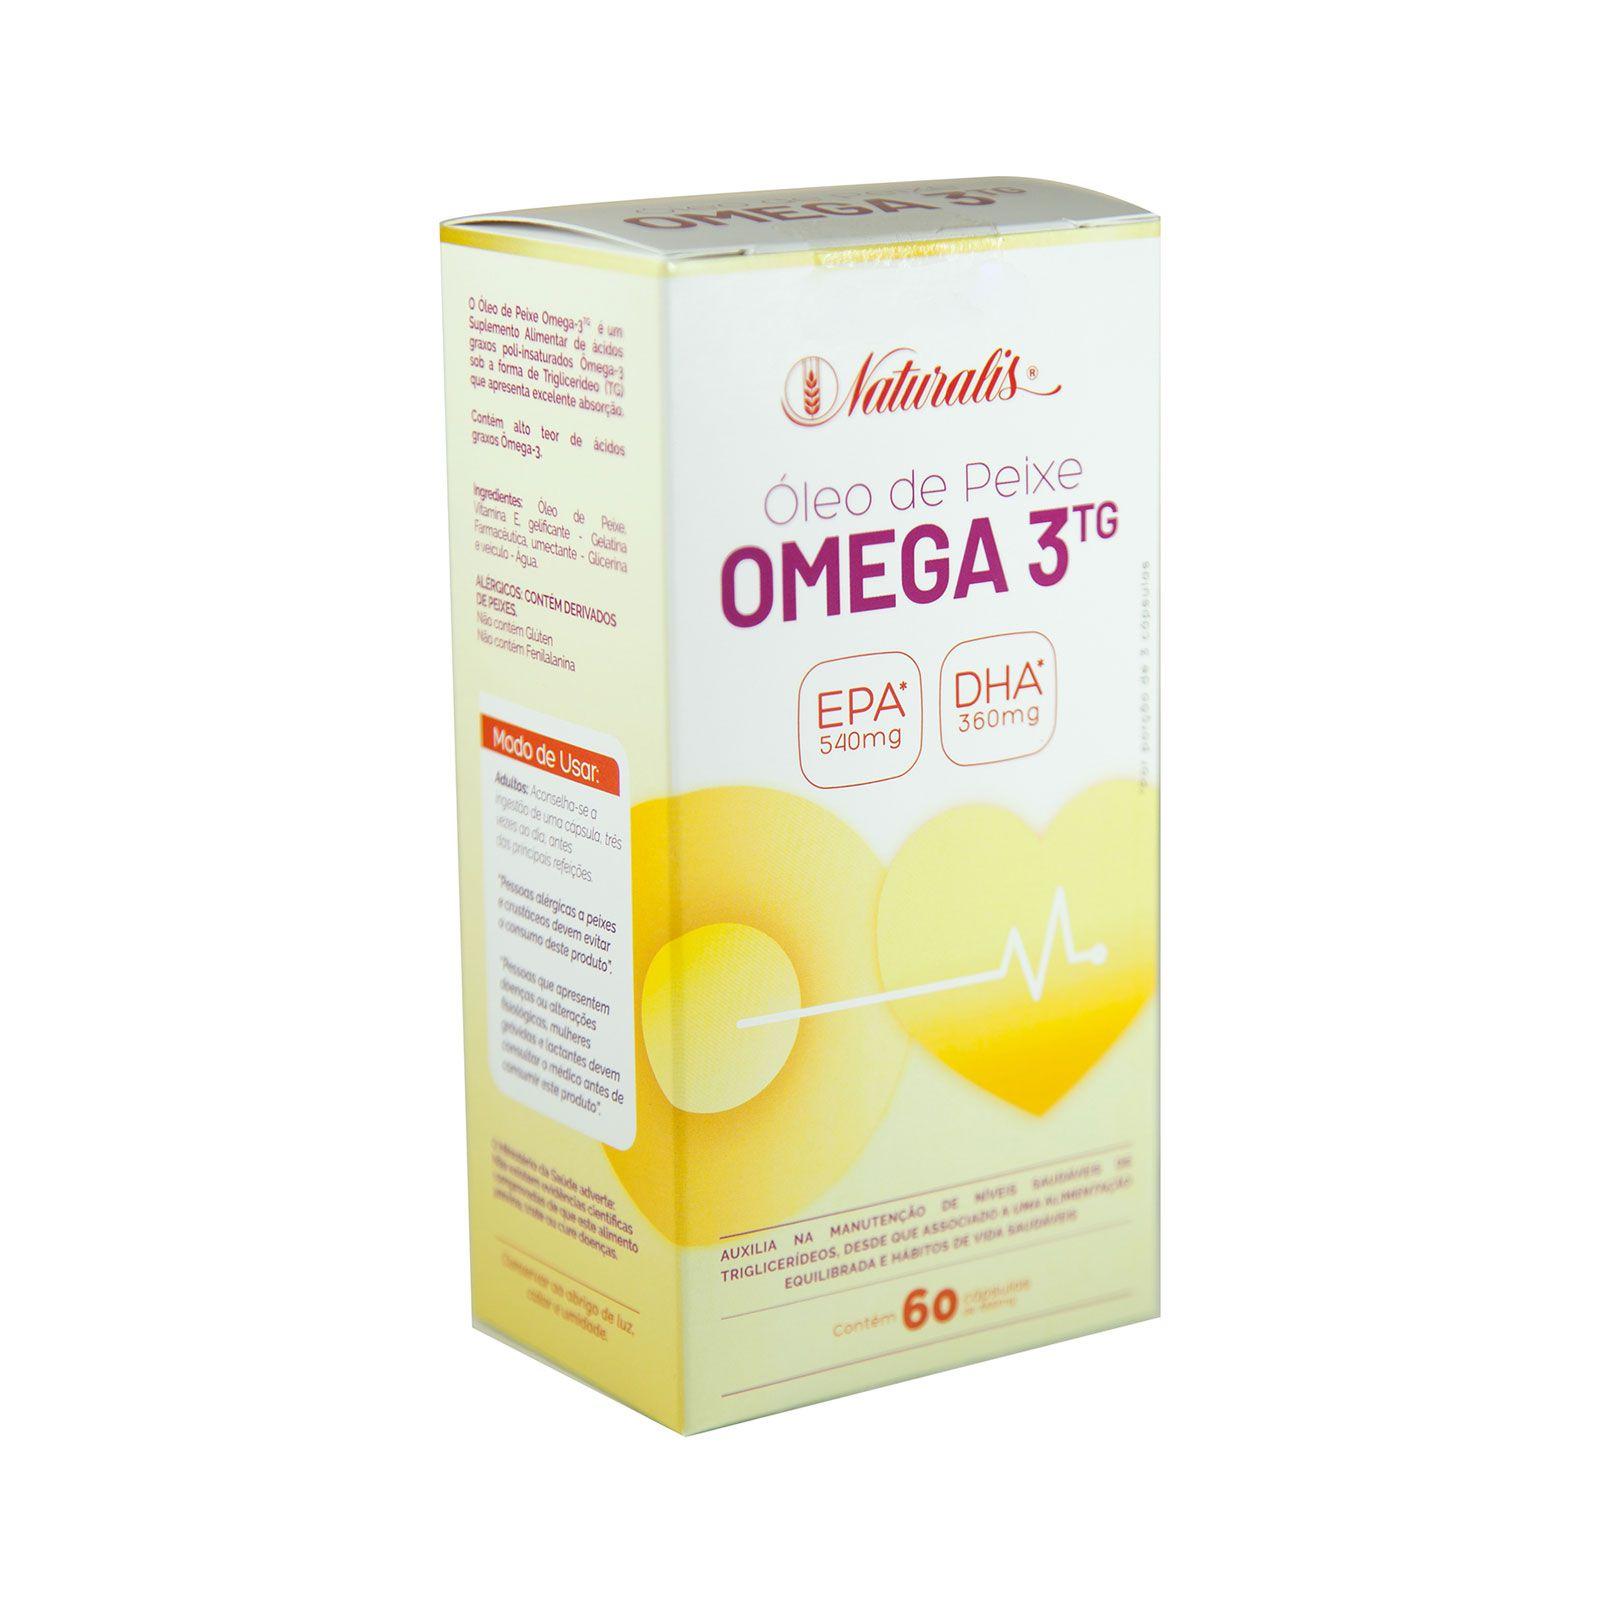 Óleo de Peixe Omega-3 Naturalis 60 Cápsulas